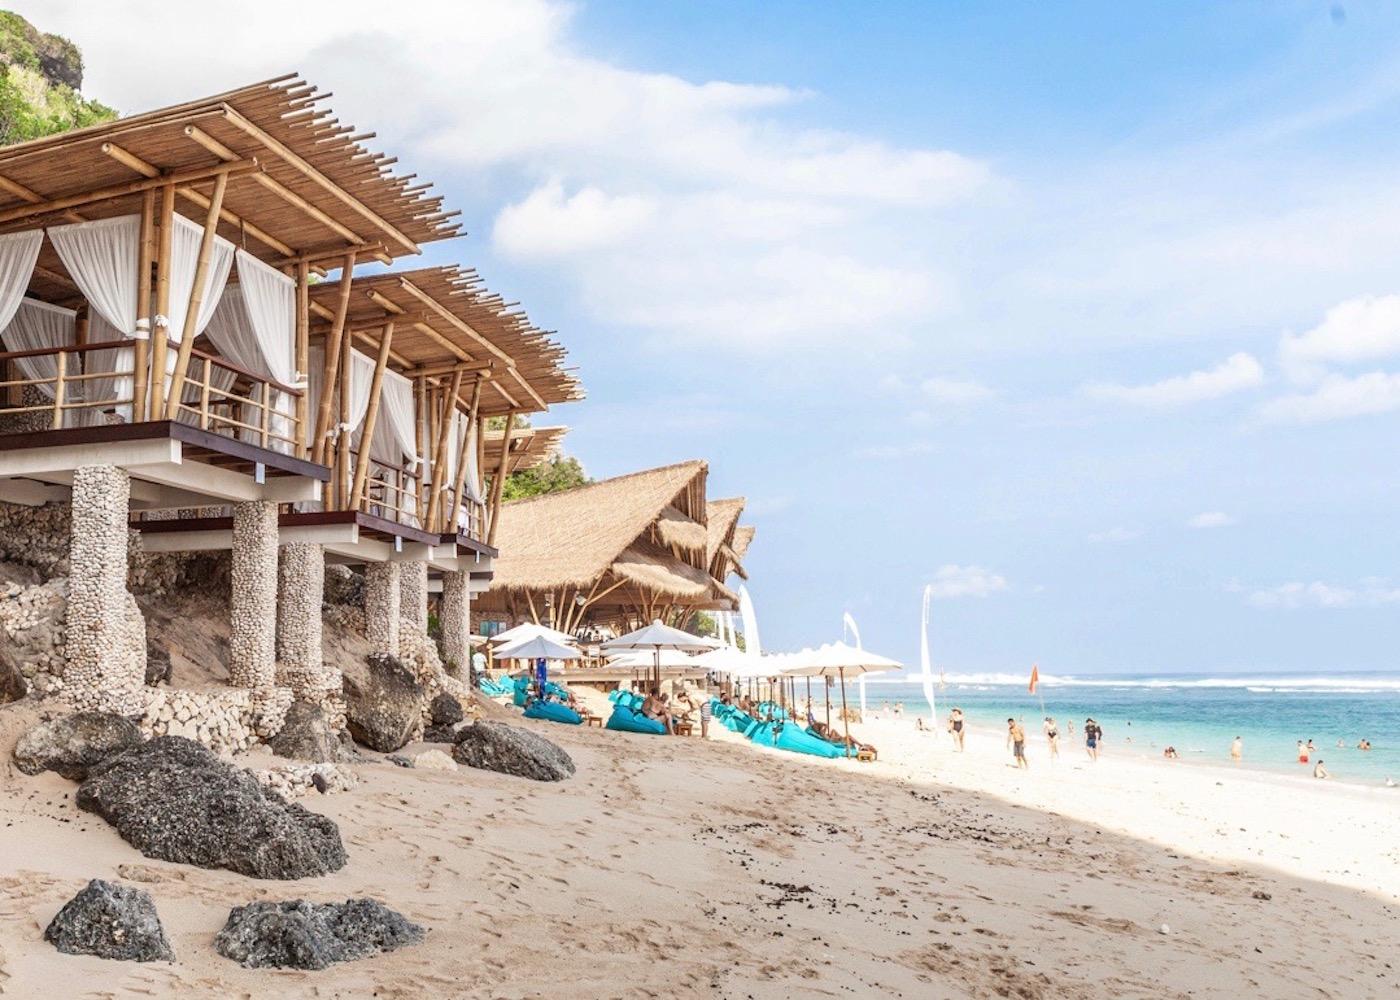 A day well spent at Sundays Beach Club in Uluwatu – sand, sea & sun-soaked splendour!